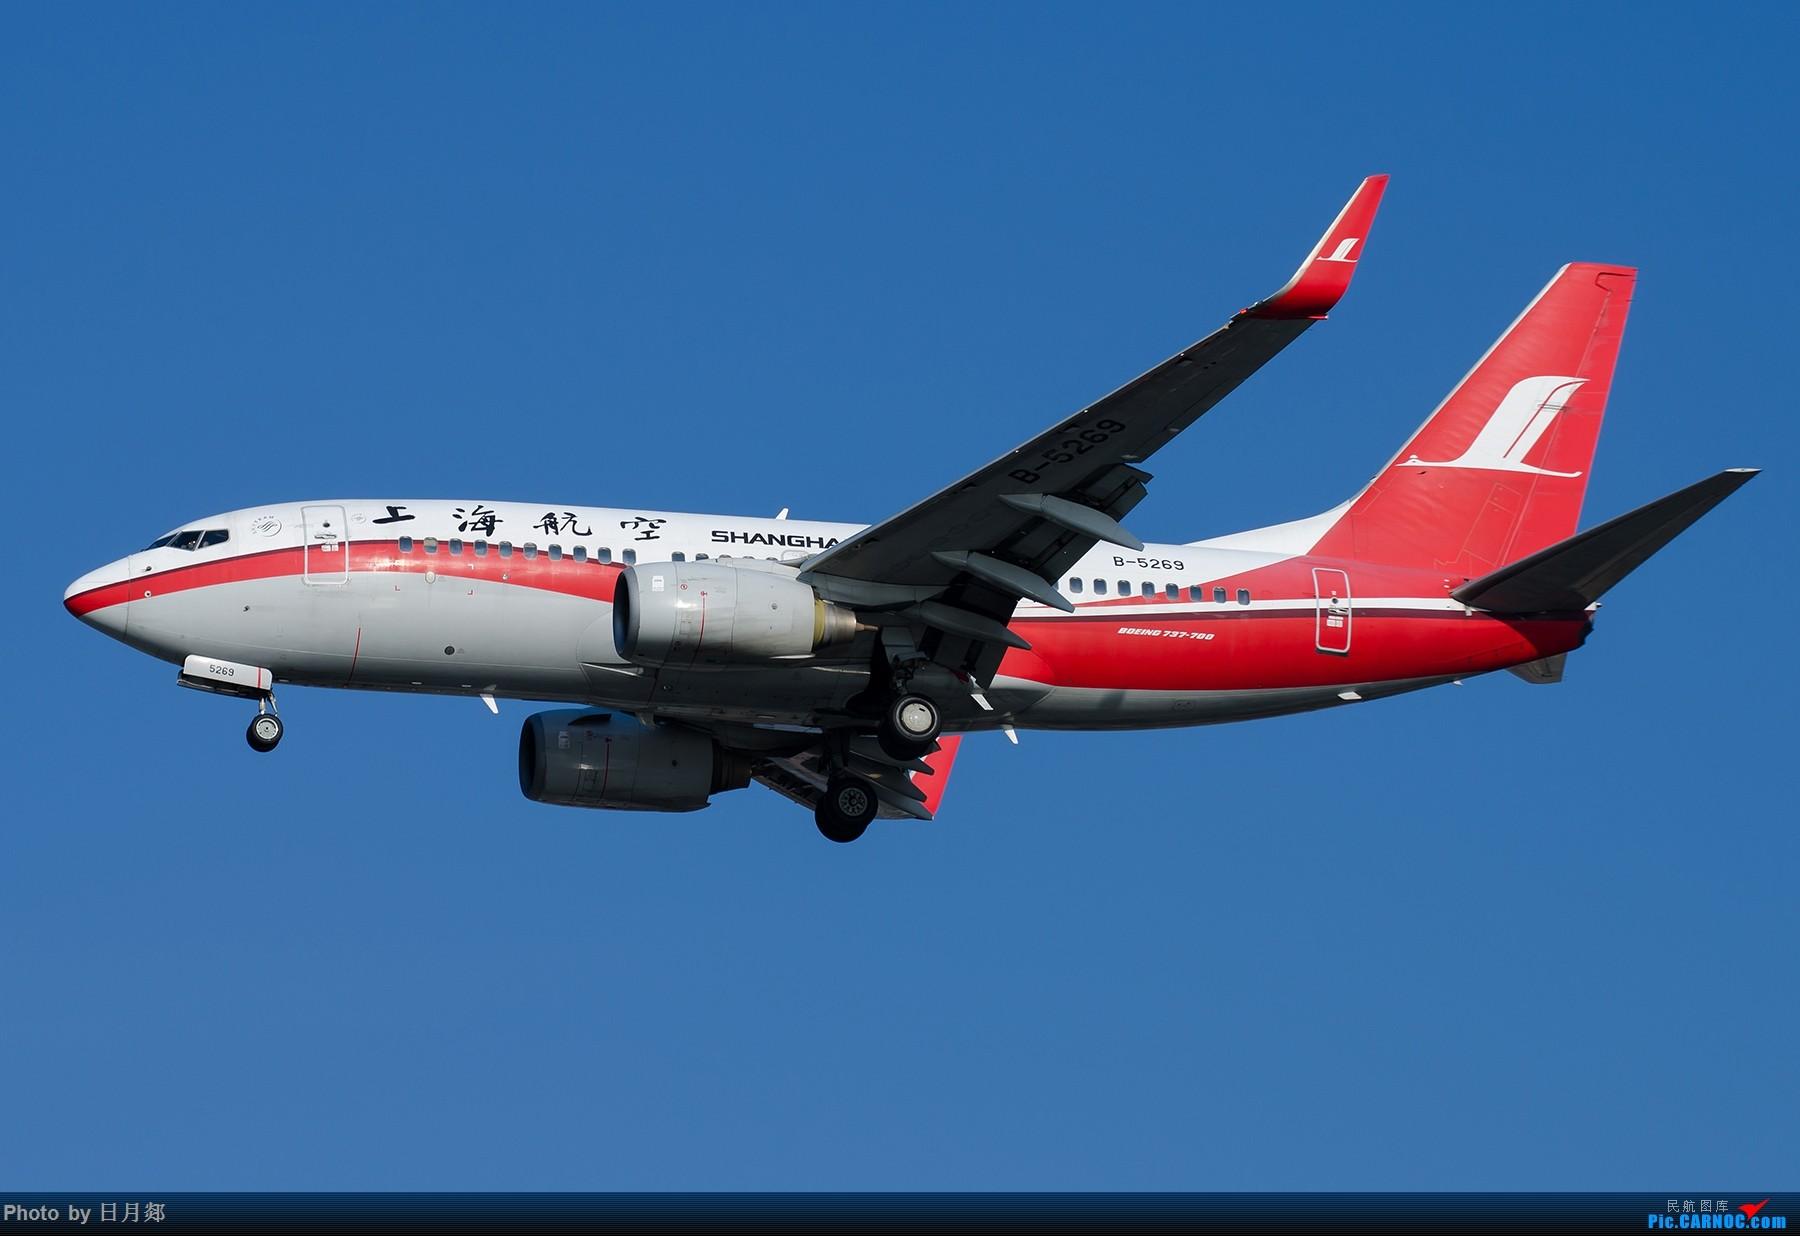 Re:[原创]【SHA拍机*1800大图】轻度污染来临前宝贵的蓝天,且拍且珍惜 BOEING 737-700 B-5269 中国上海虹桥国际机场